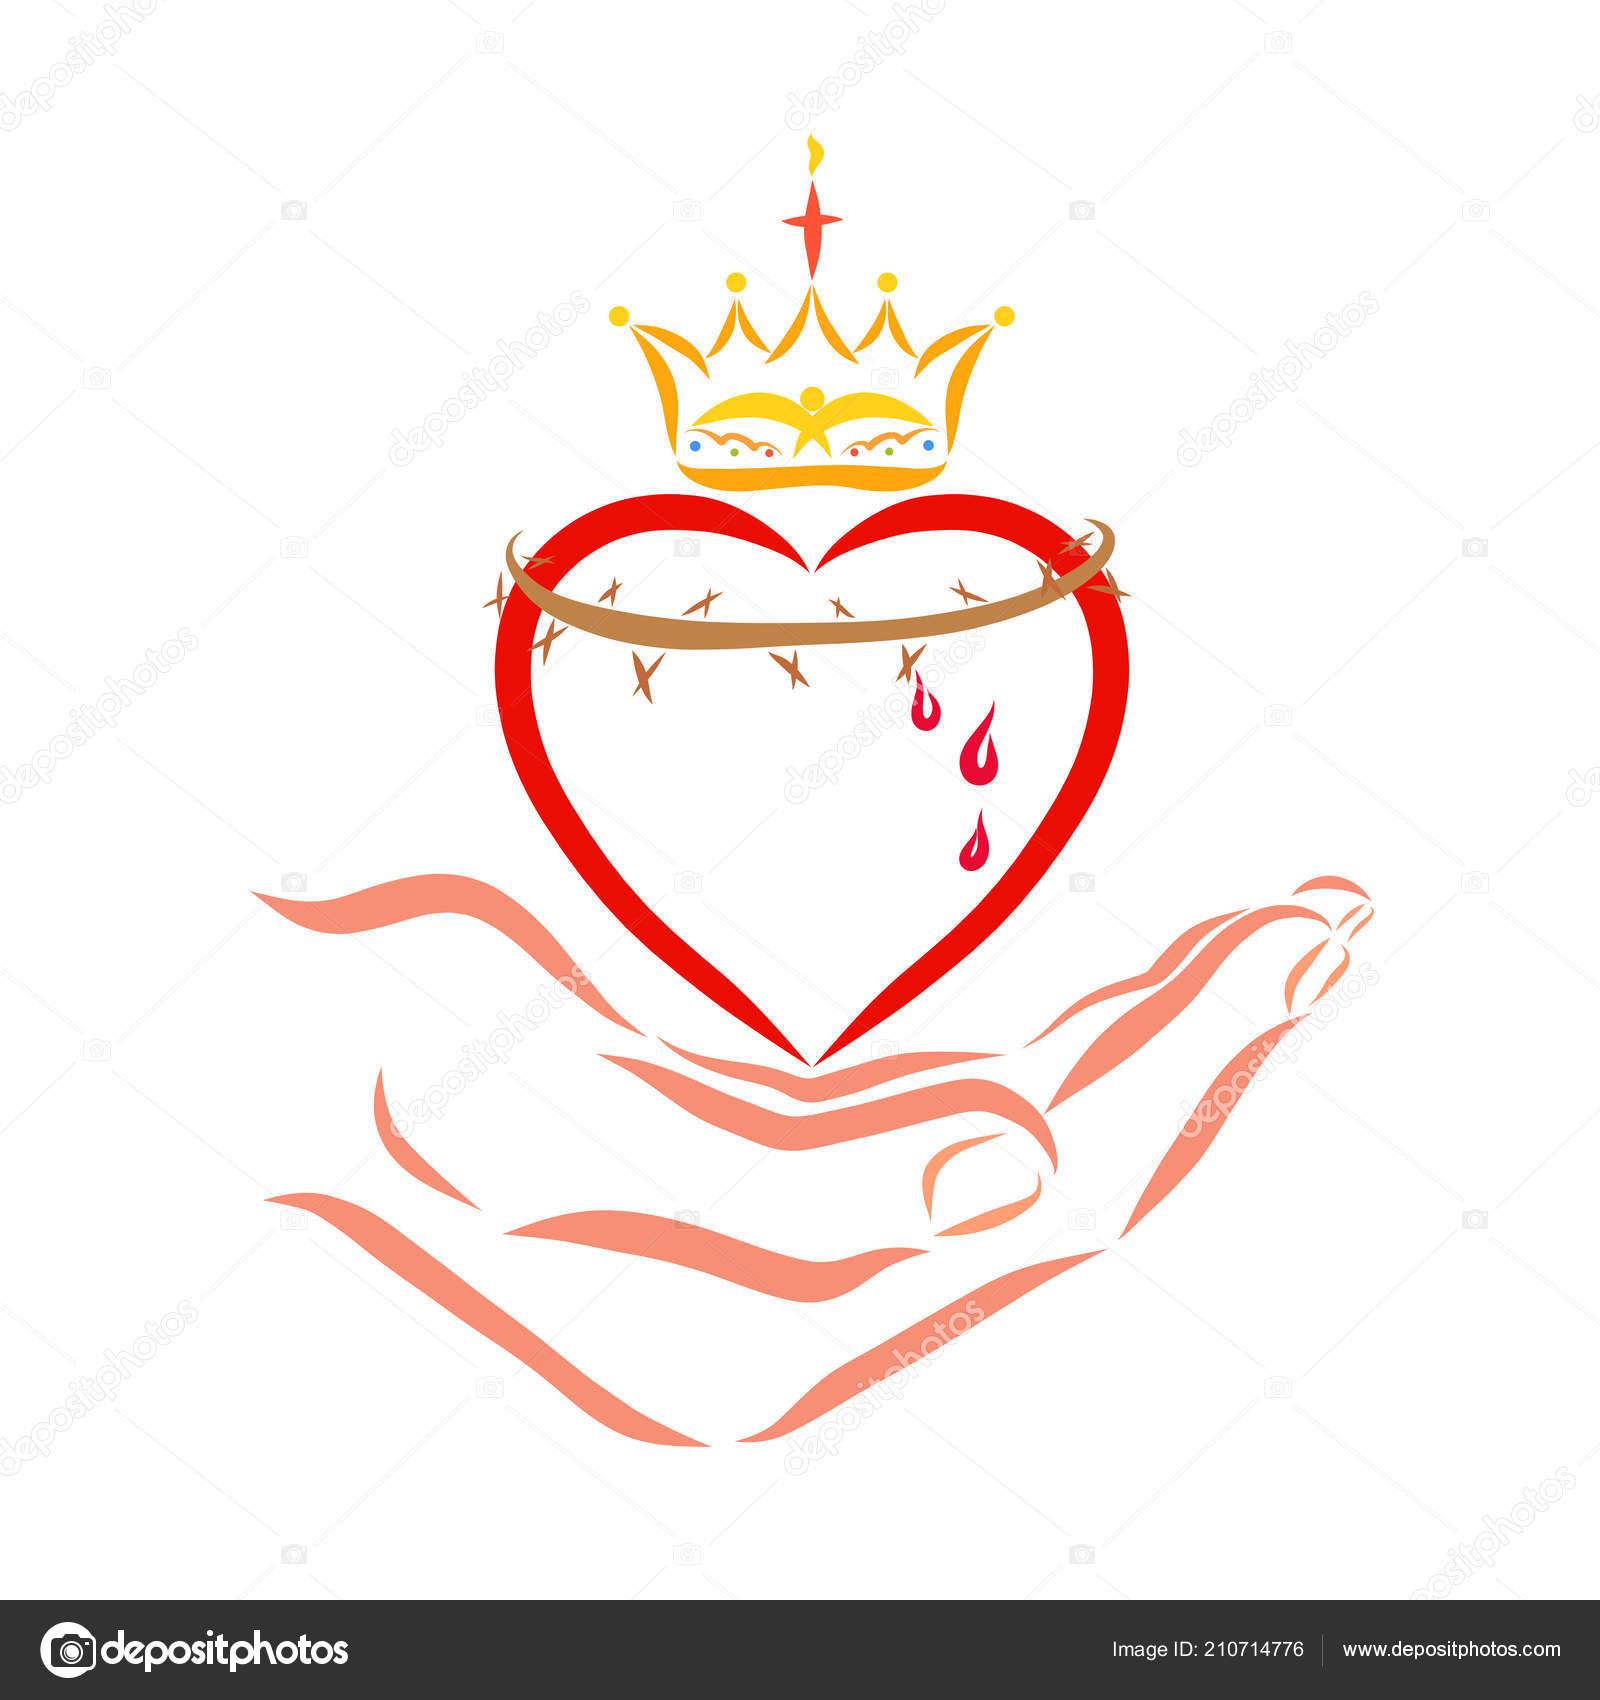 Heart Crown Crown Thorns Hand Savior Yuliya4